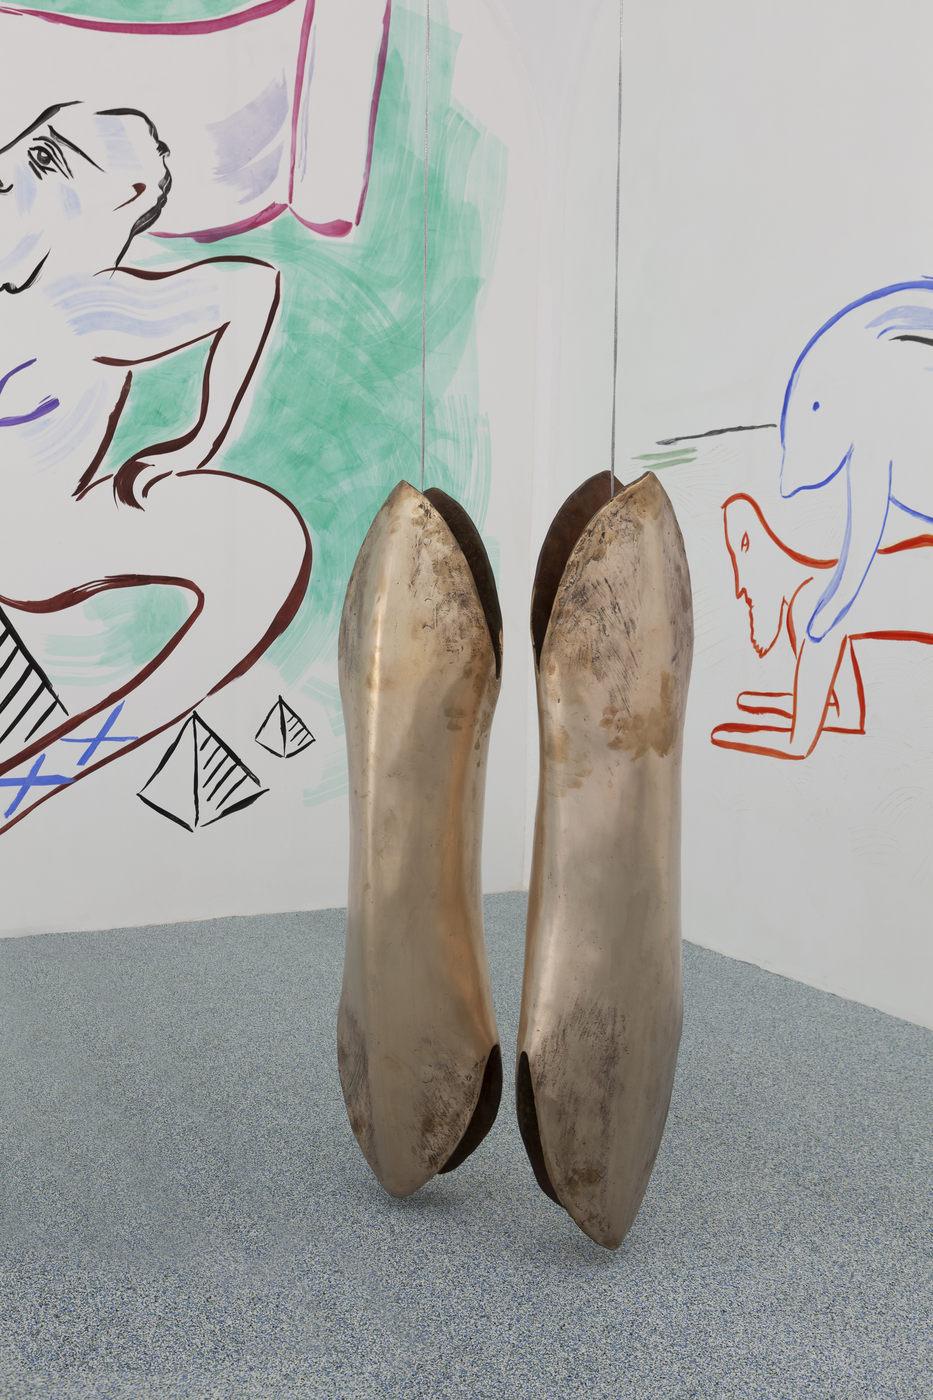 19. Camille Henrot, Monday. Installation view, Fondazione Memmo, Rome, 2016jpg